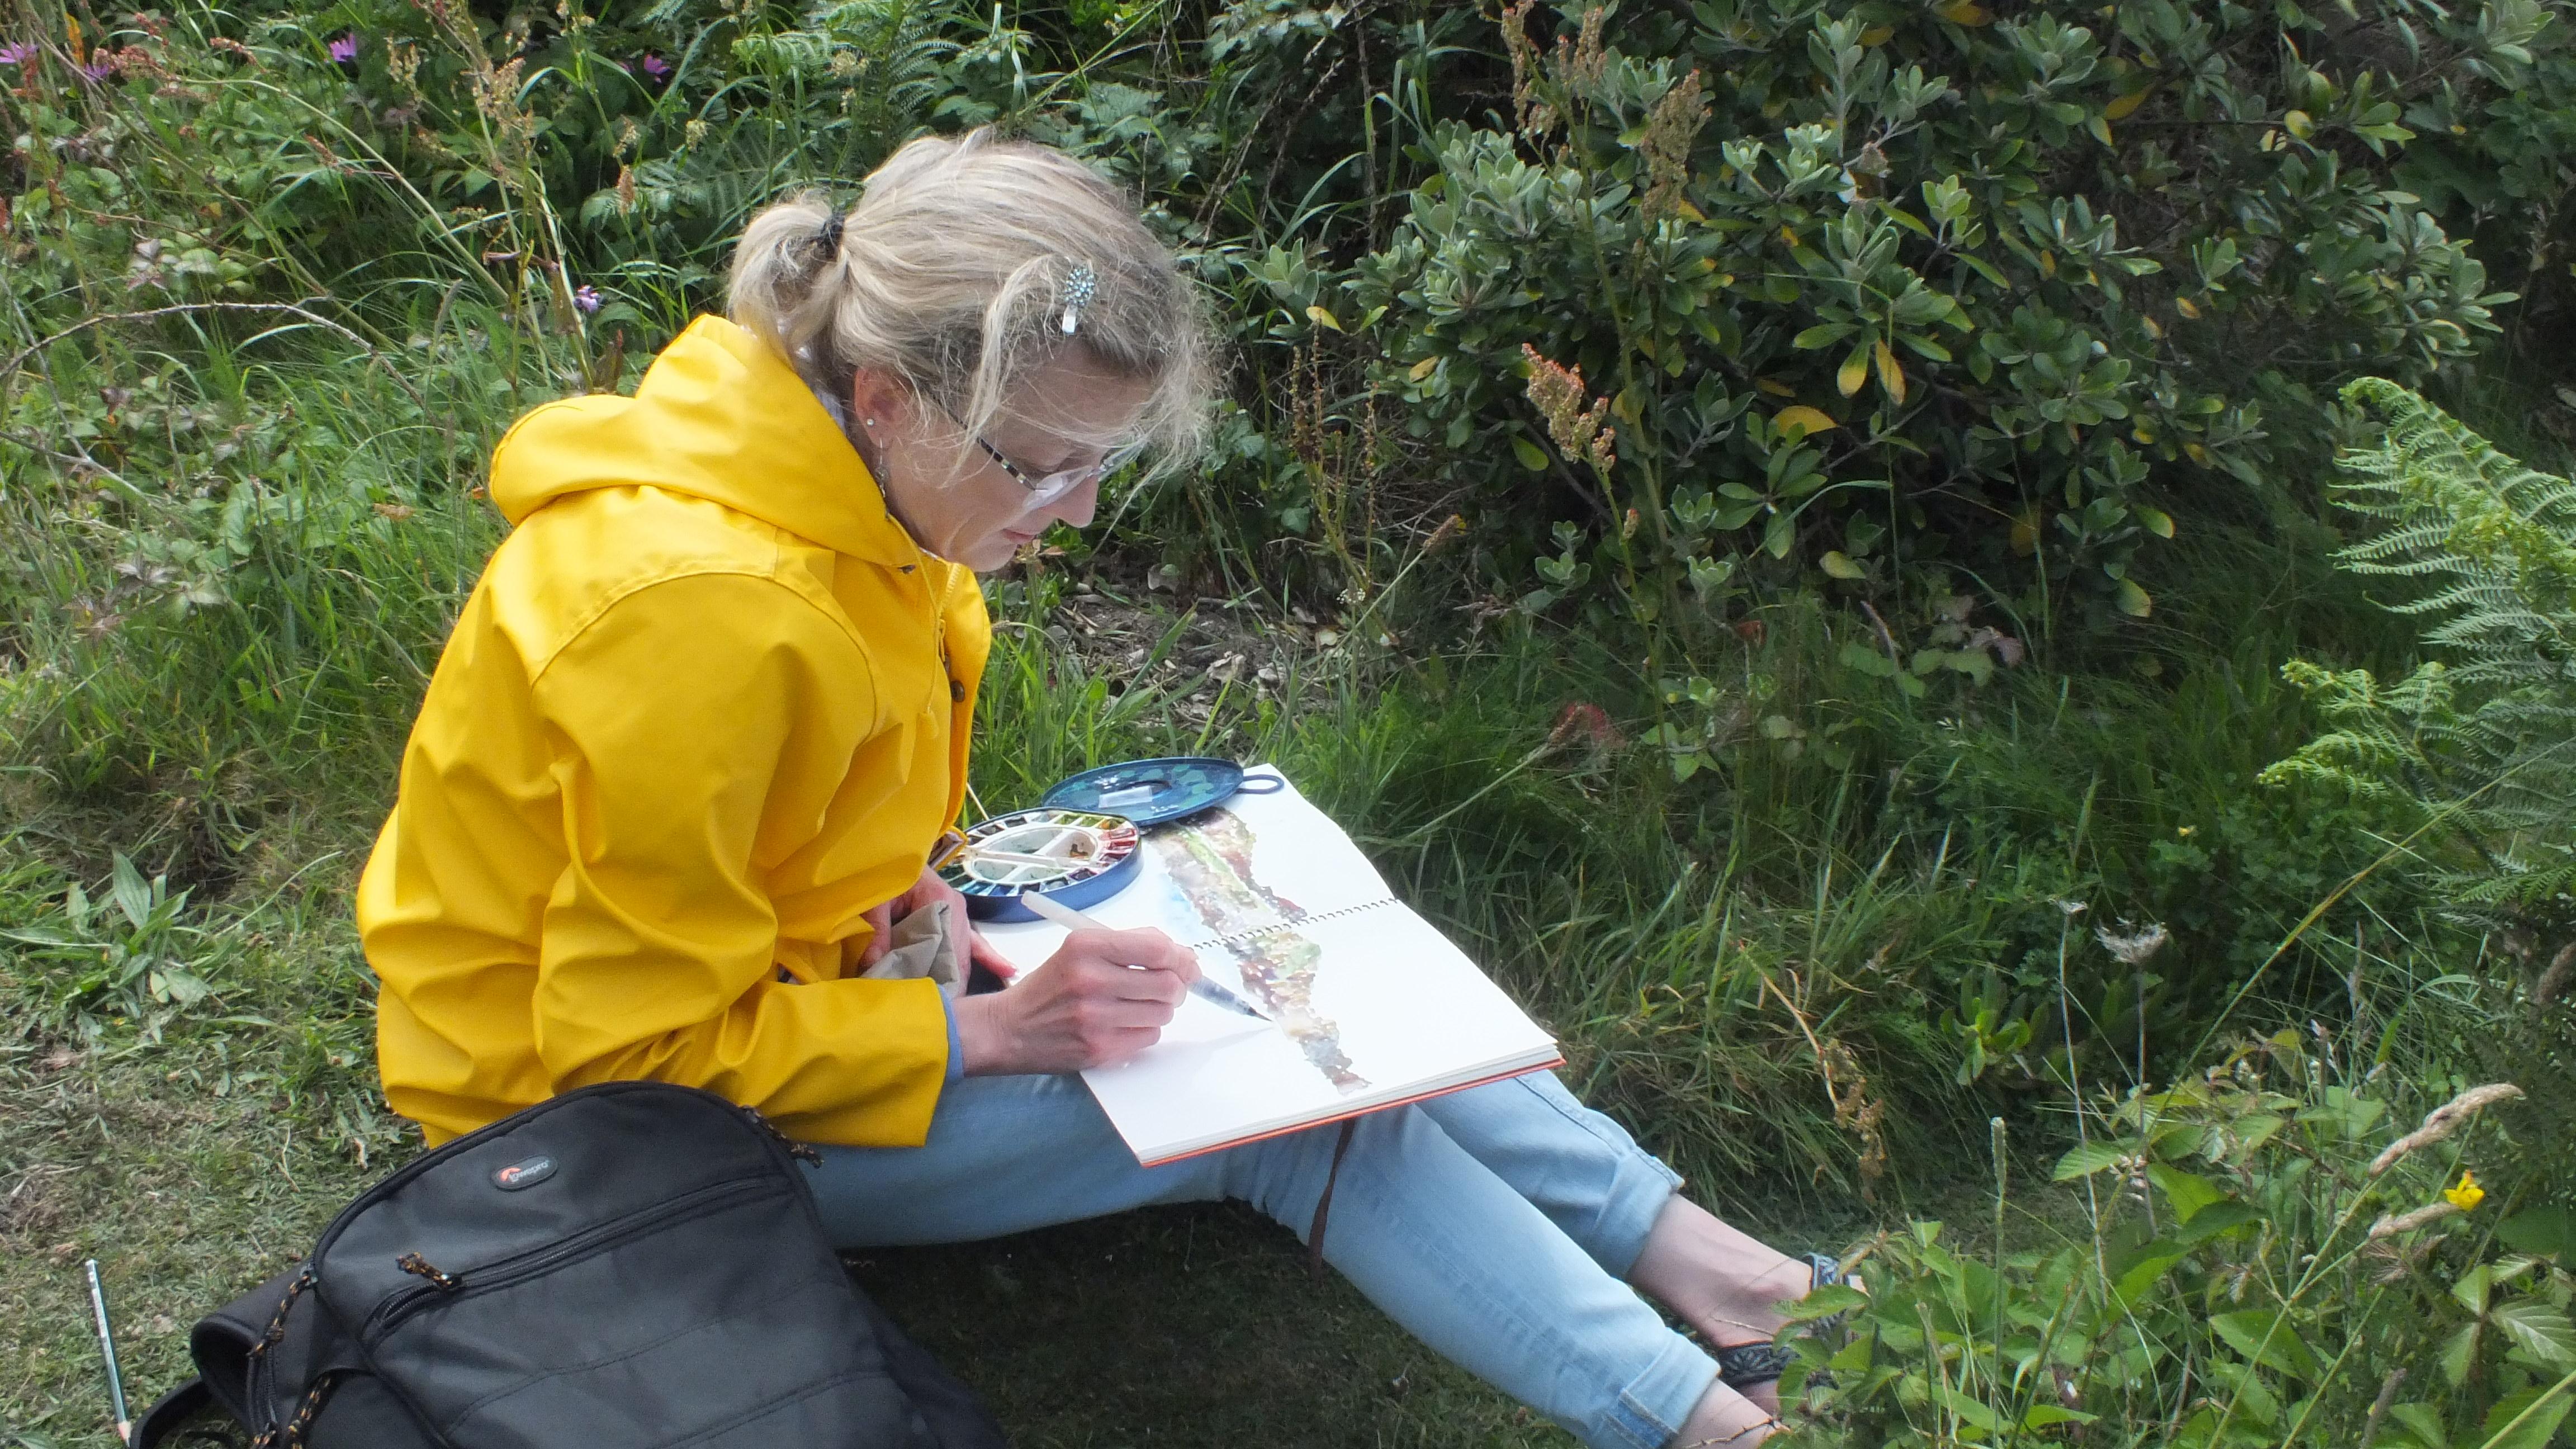 Drawing in Cornwall, UK